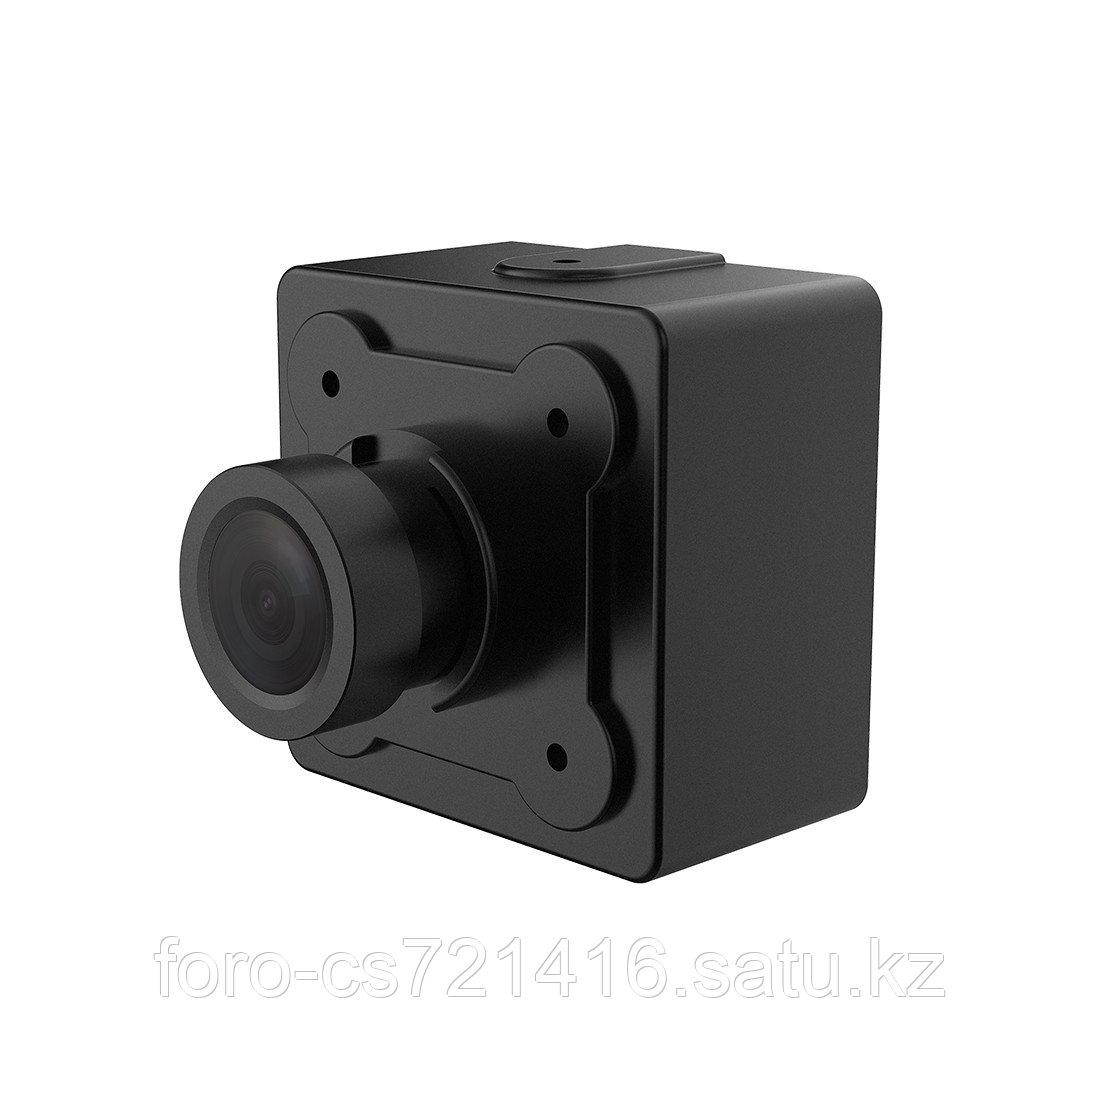 Видеокамера Dahua IPC-HUM8231-L5